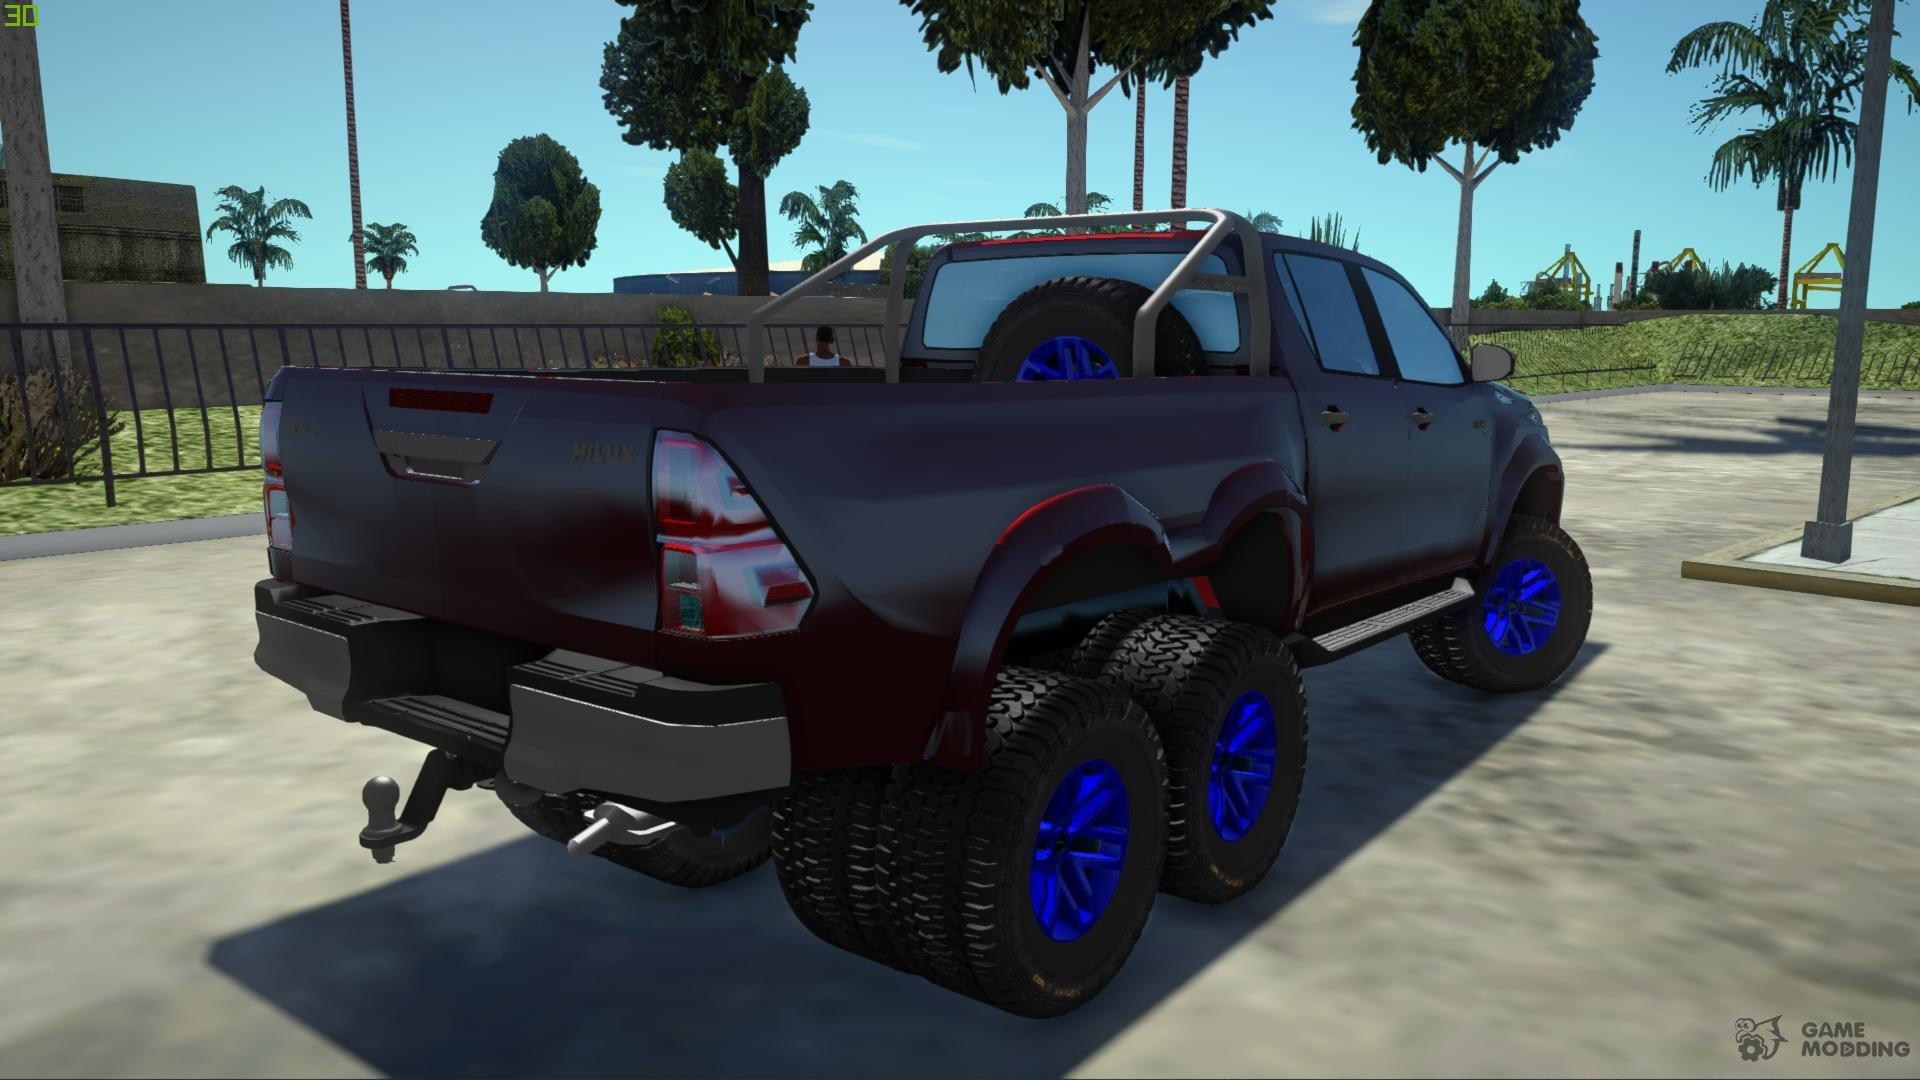 Gta 6 5 4 Cars Minecraft 1 Mod